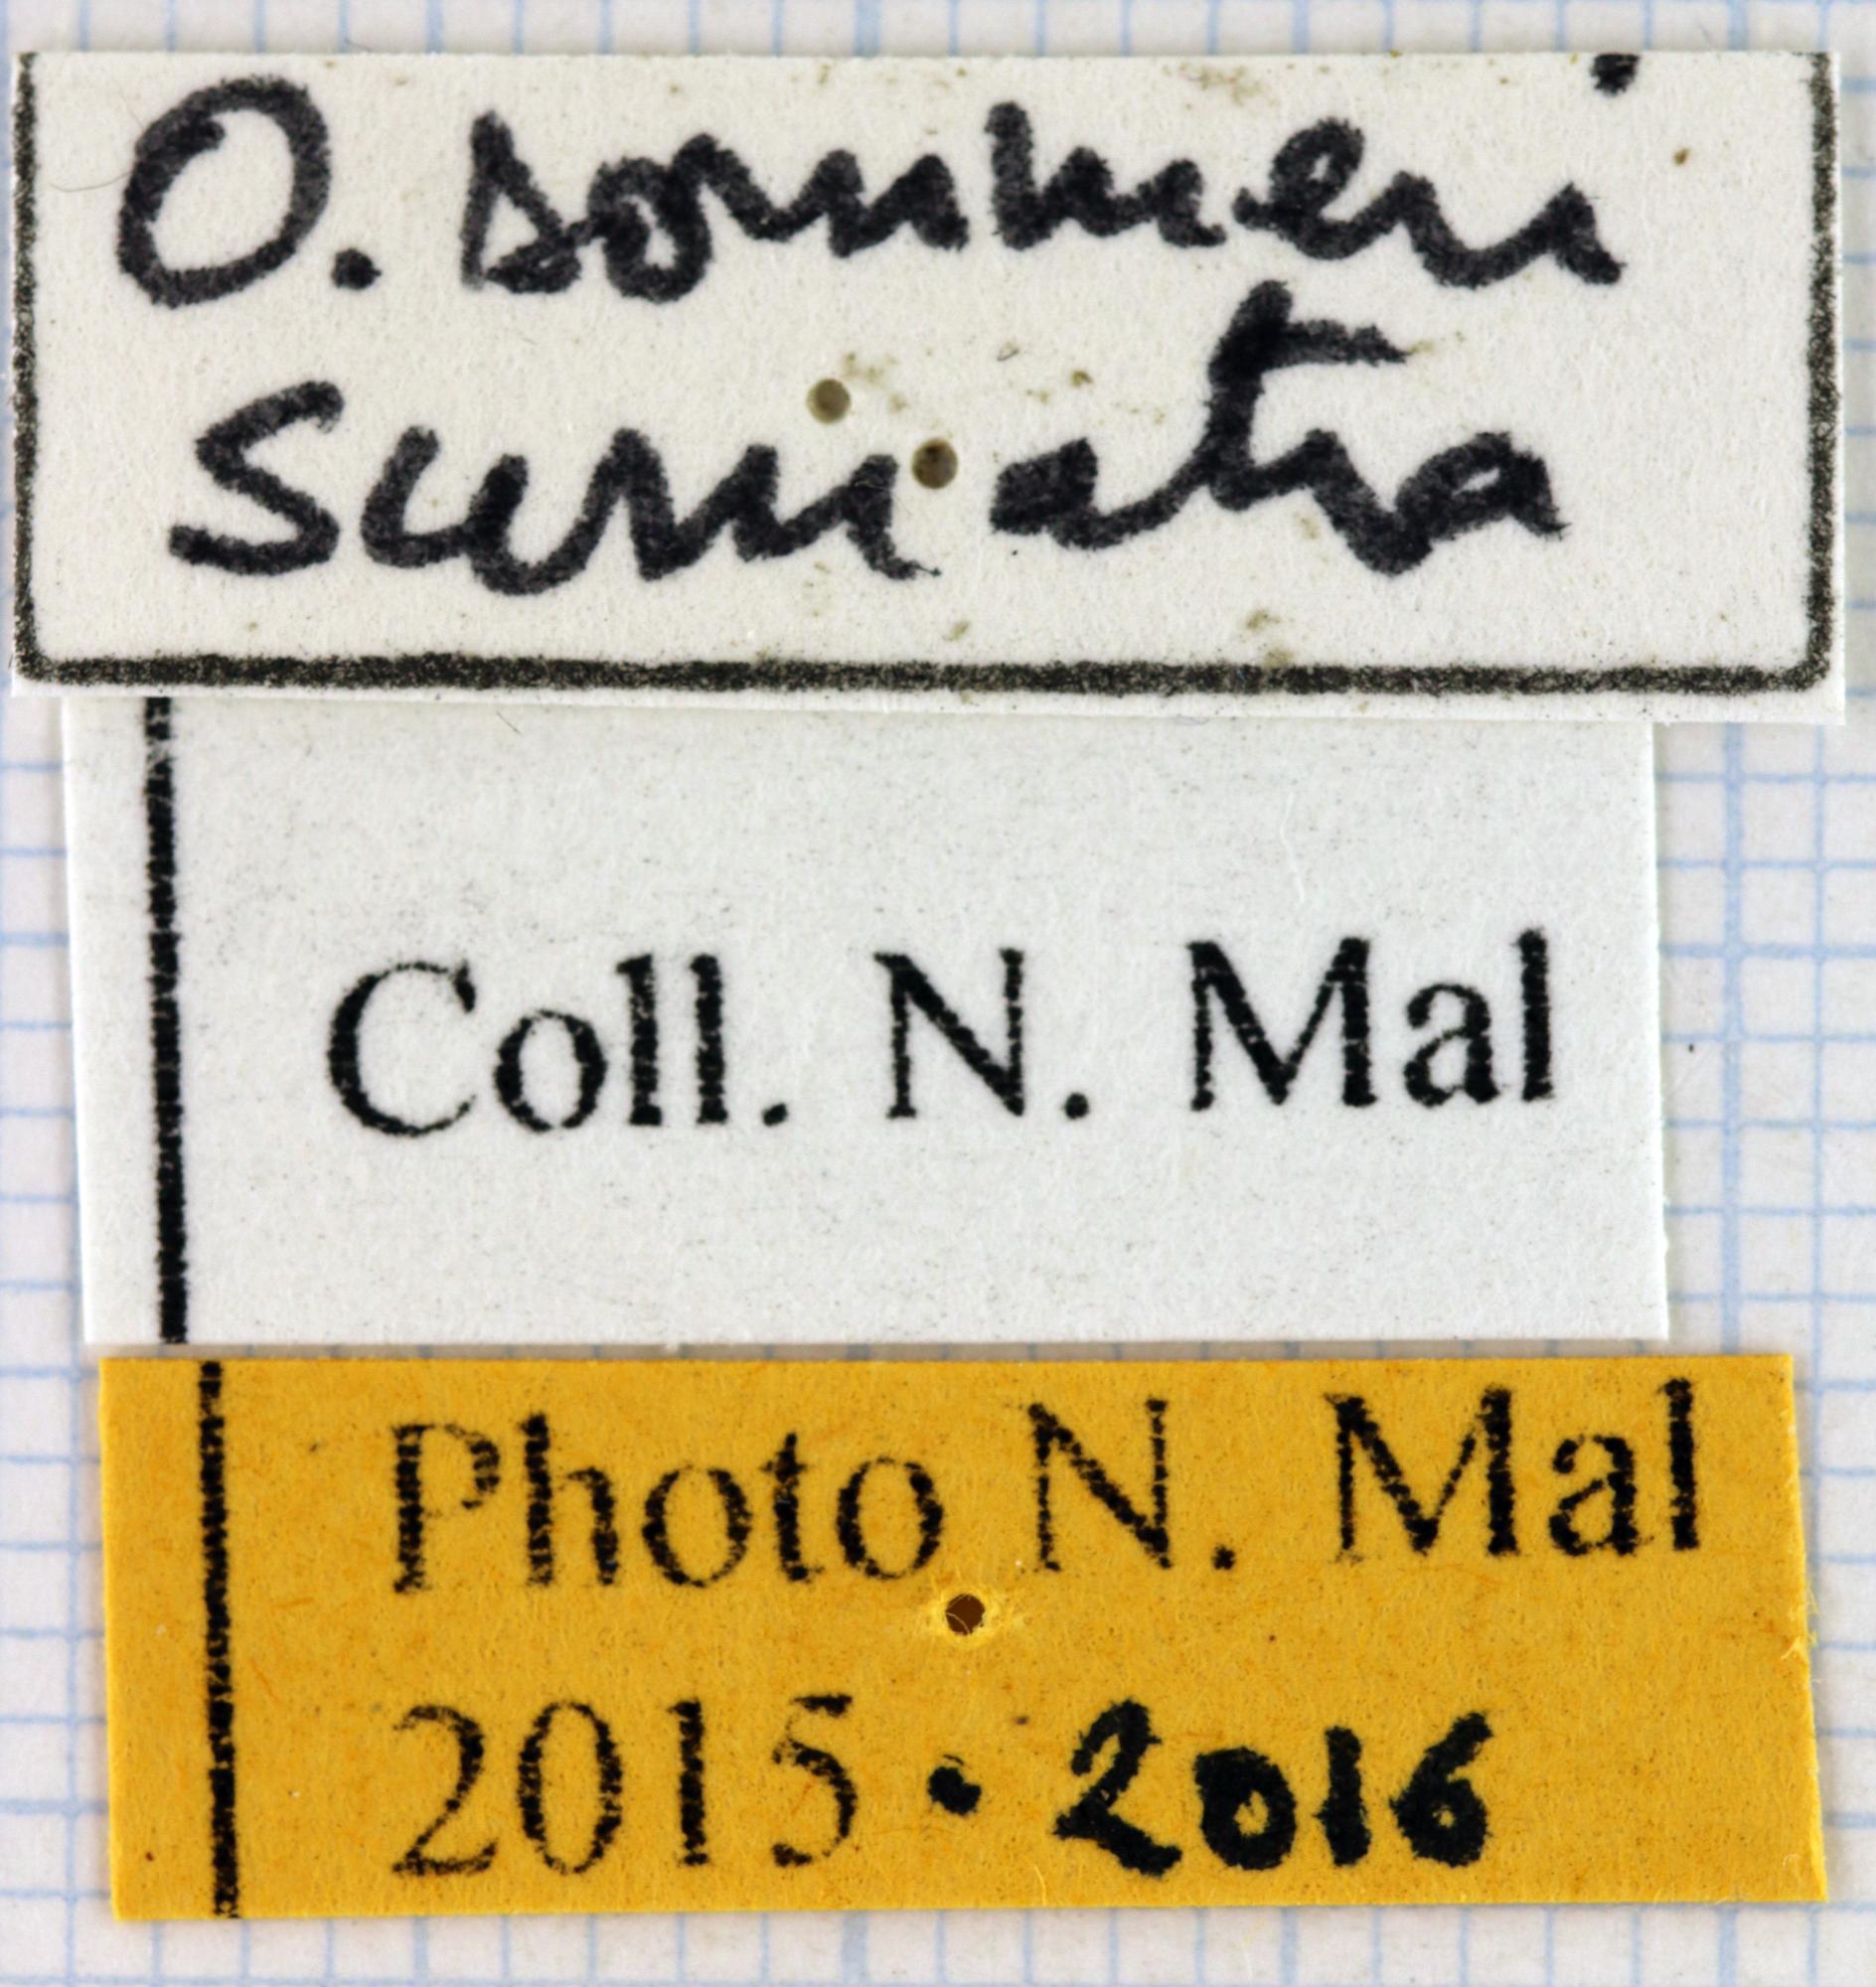 Odontolabis sommeri lab 68076.jpg